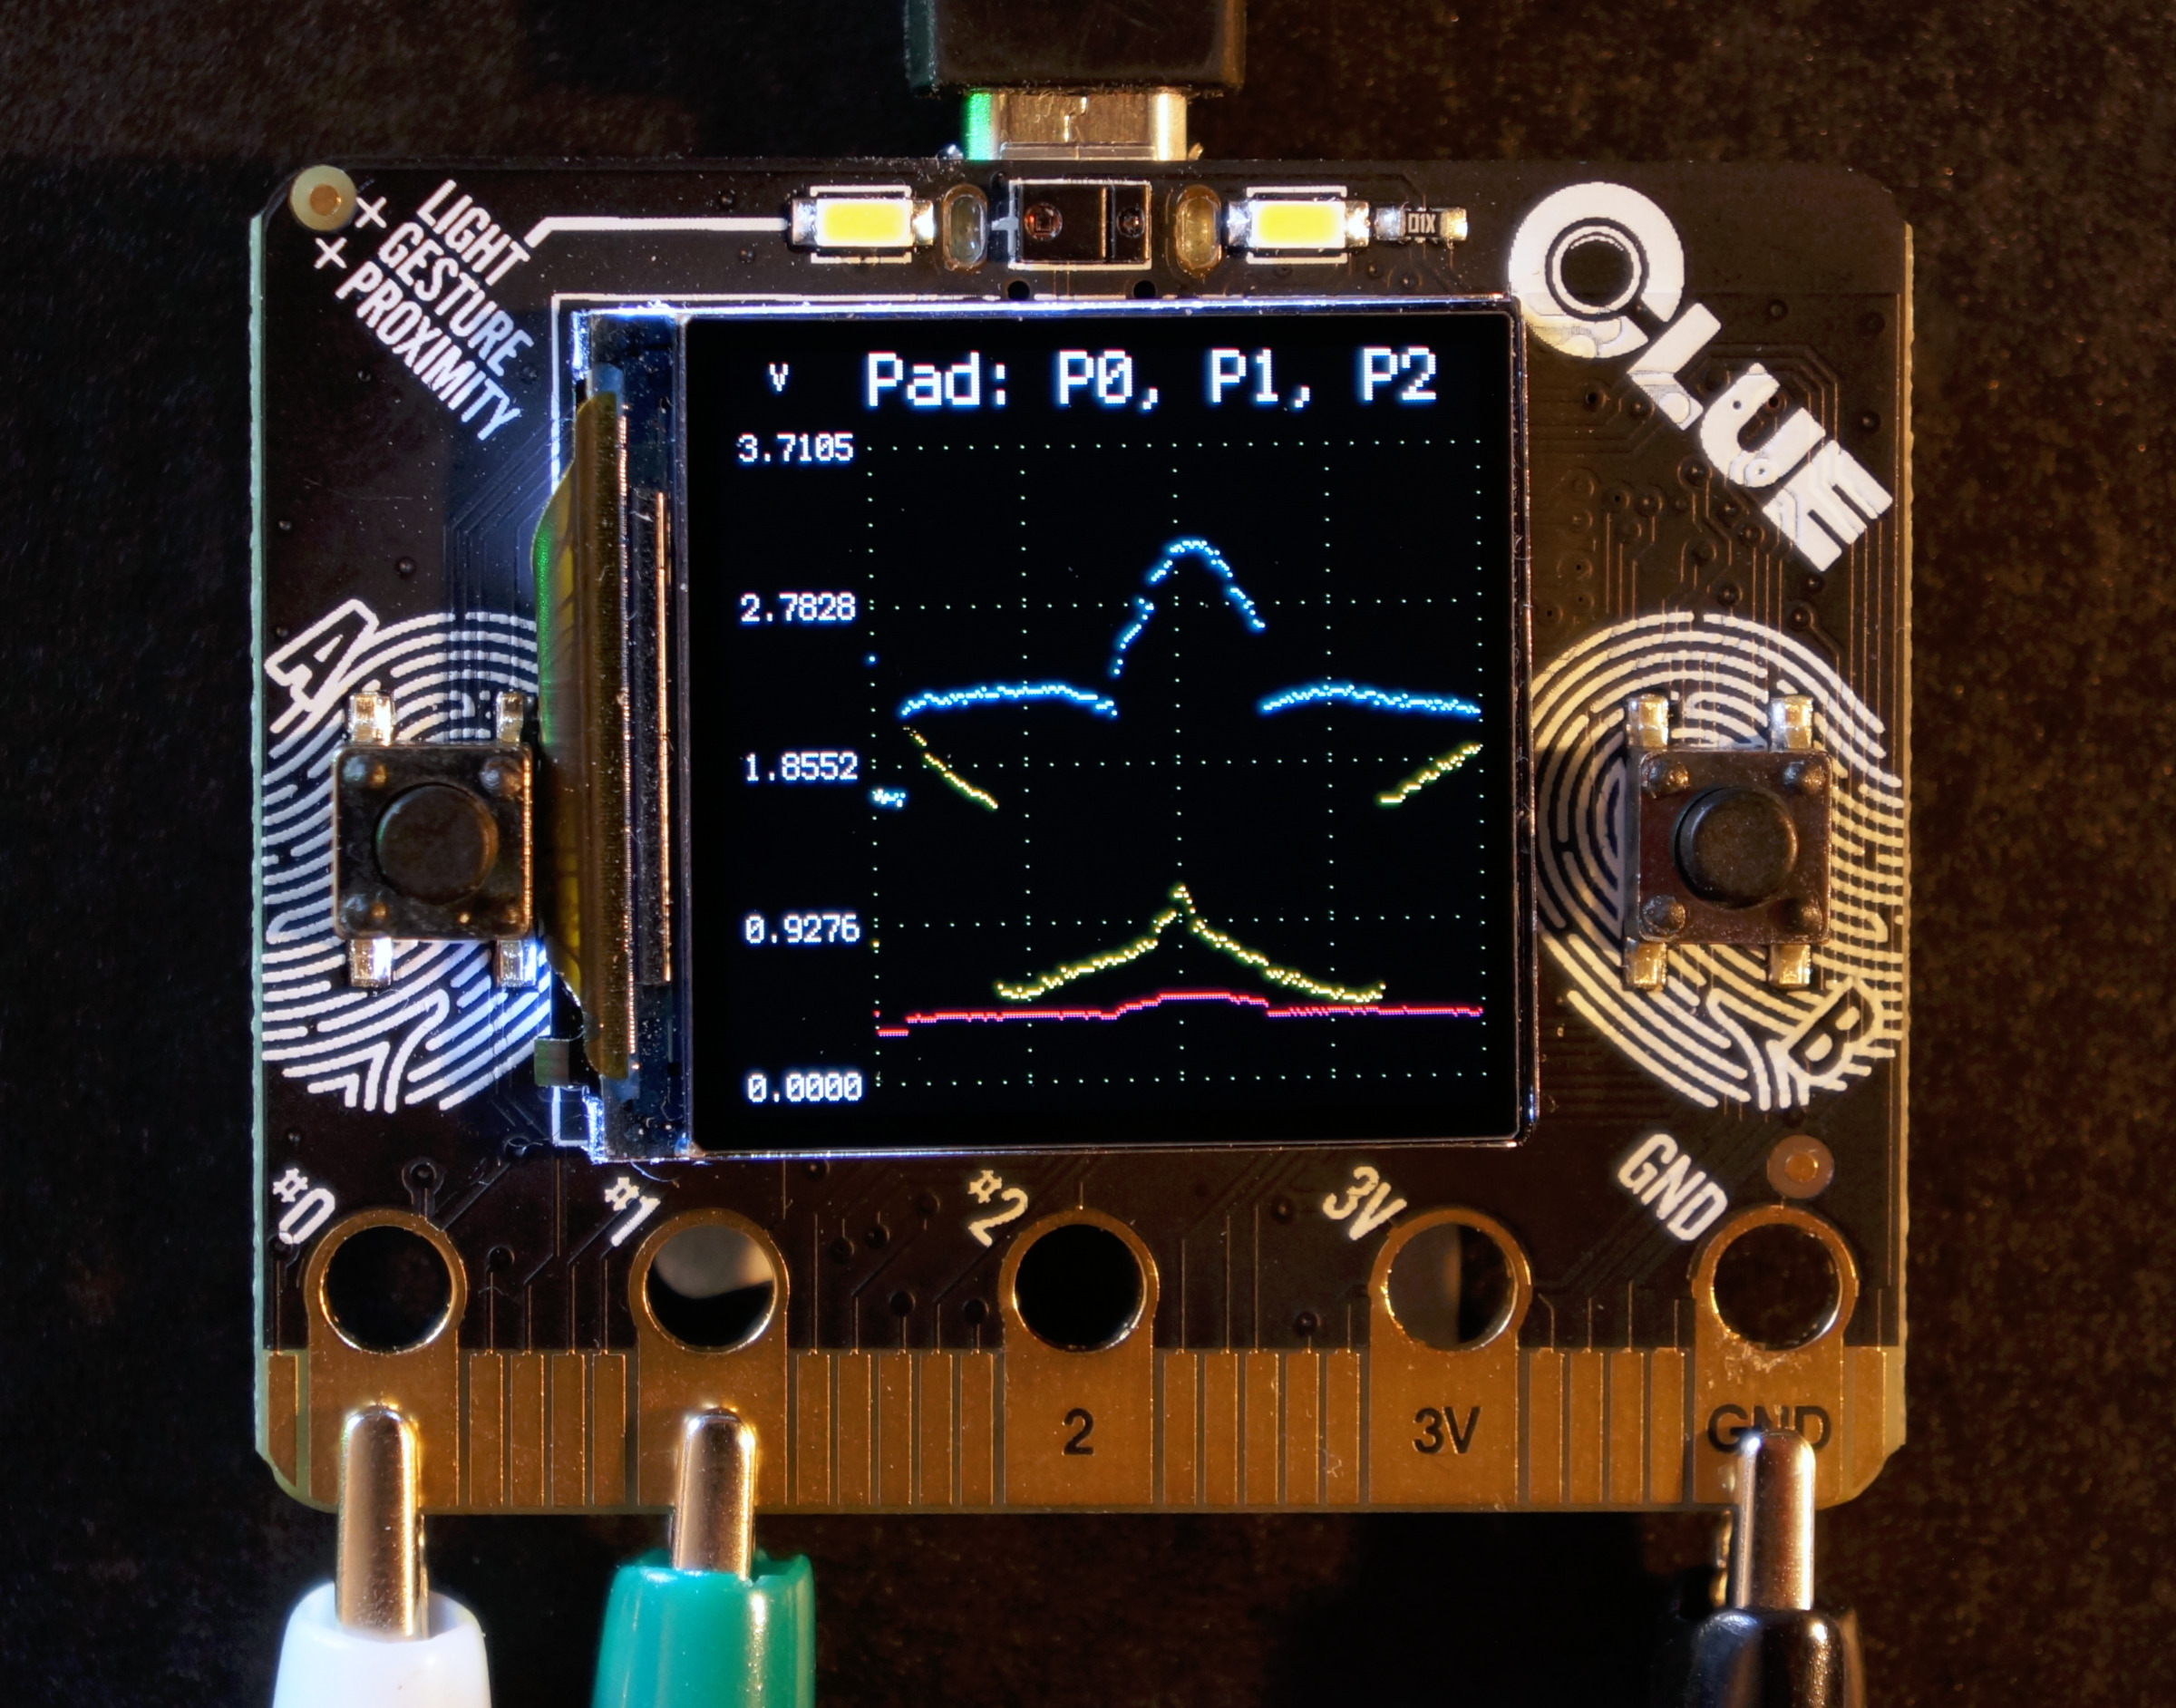 sensors_clue-sensor-plotter-pads-2400x1800.jpg